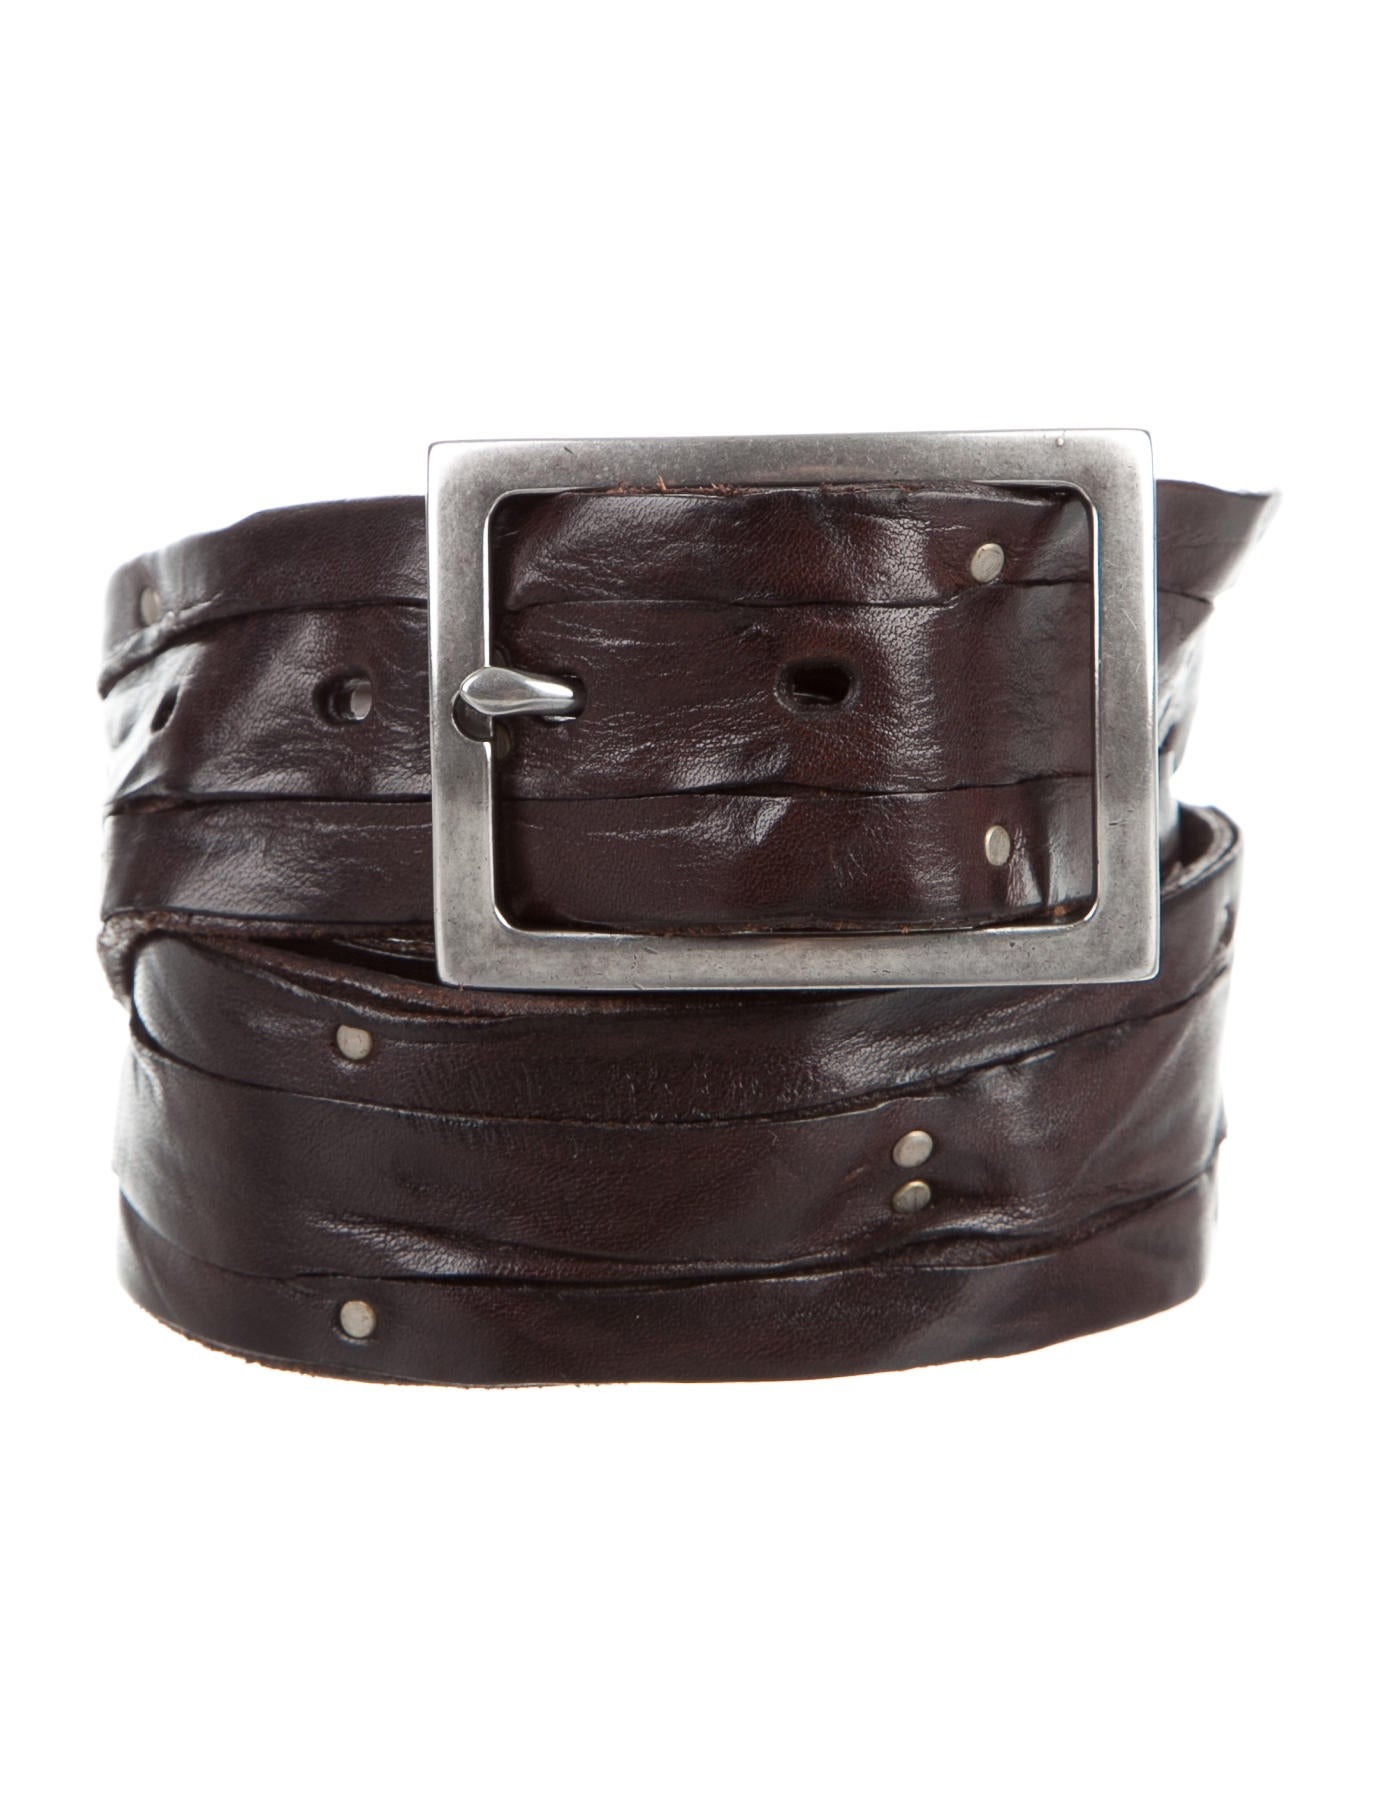 varvatos distressed leather belt accessories